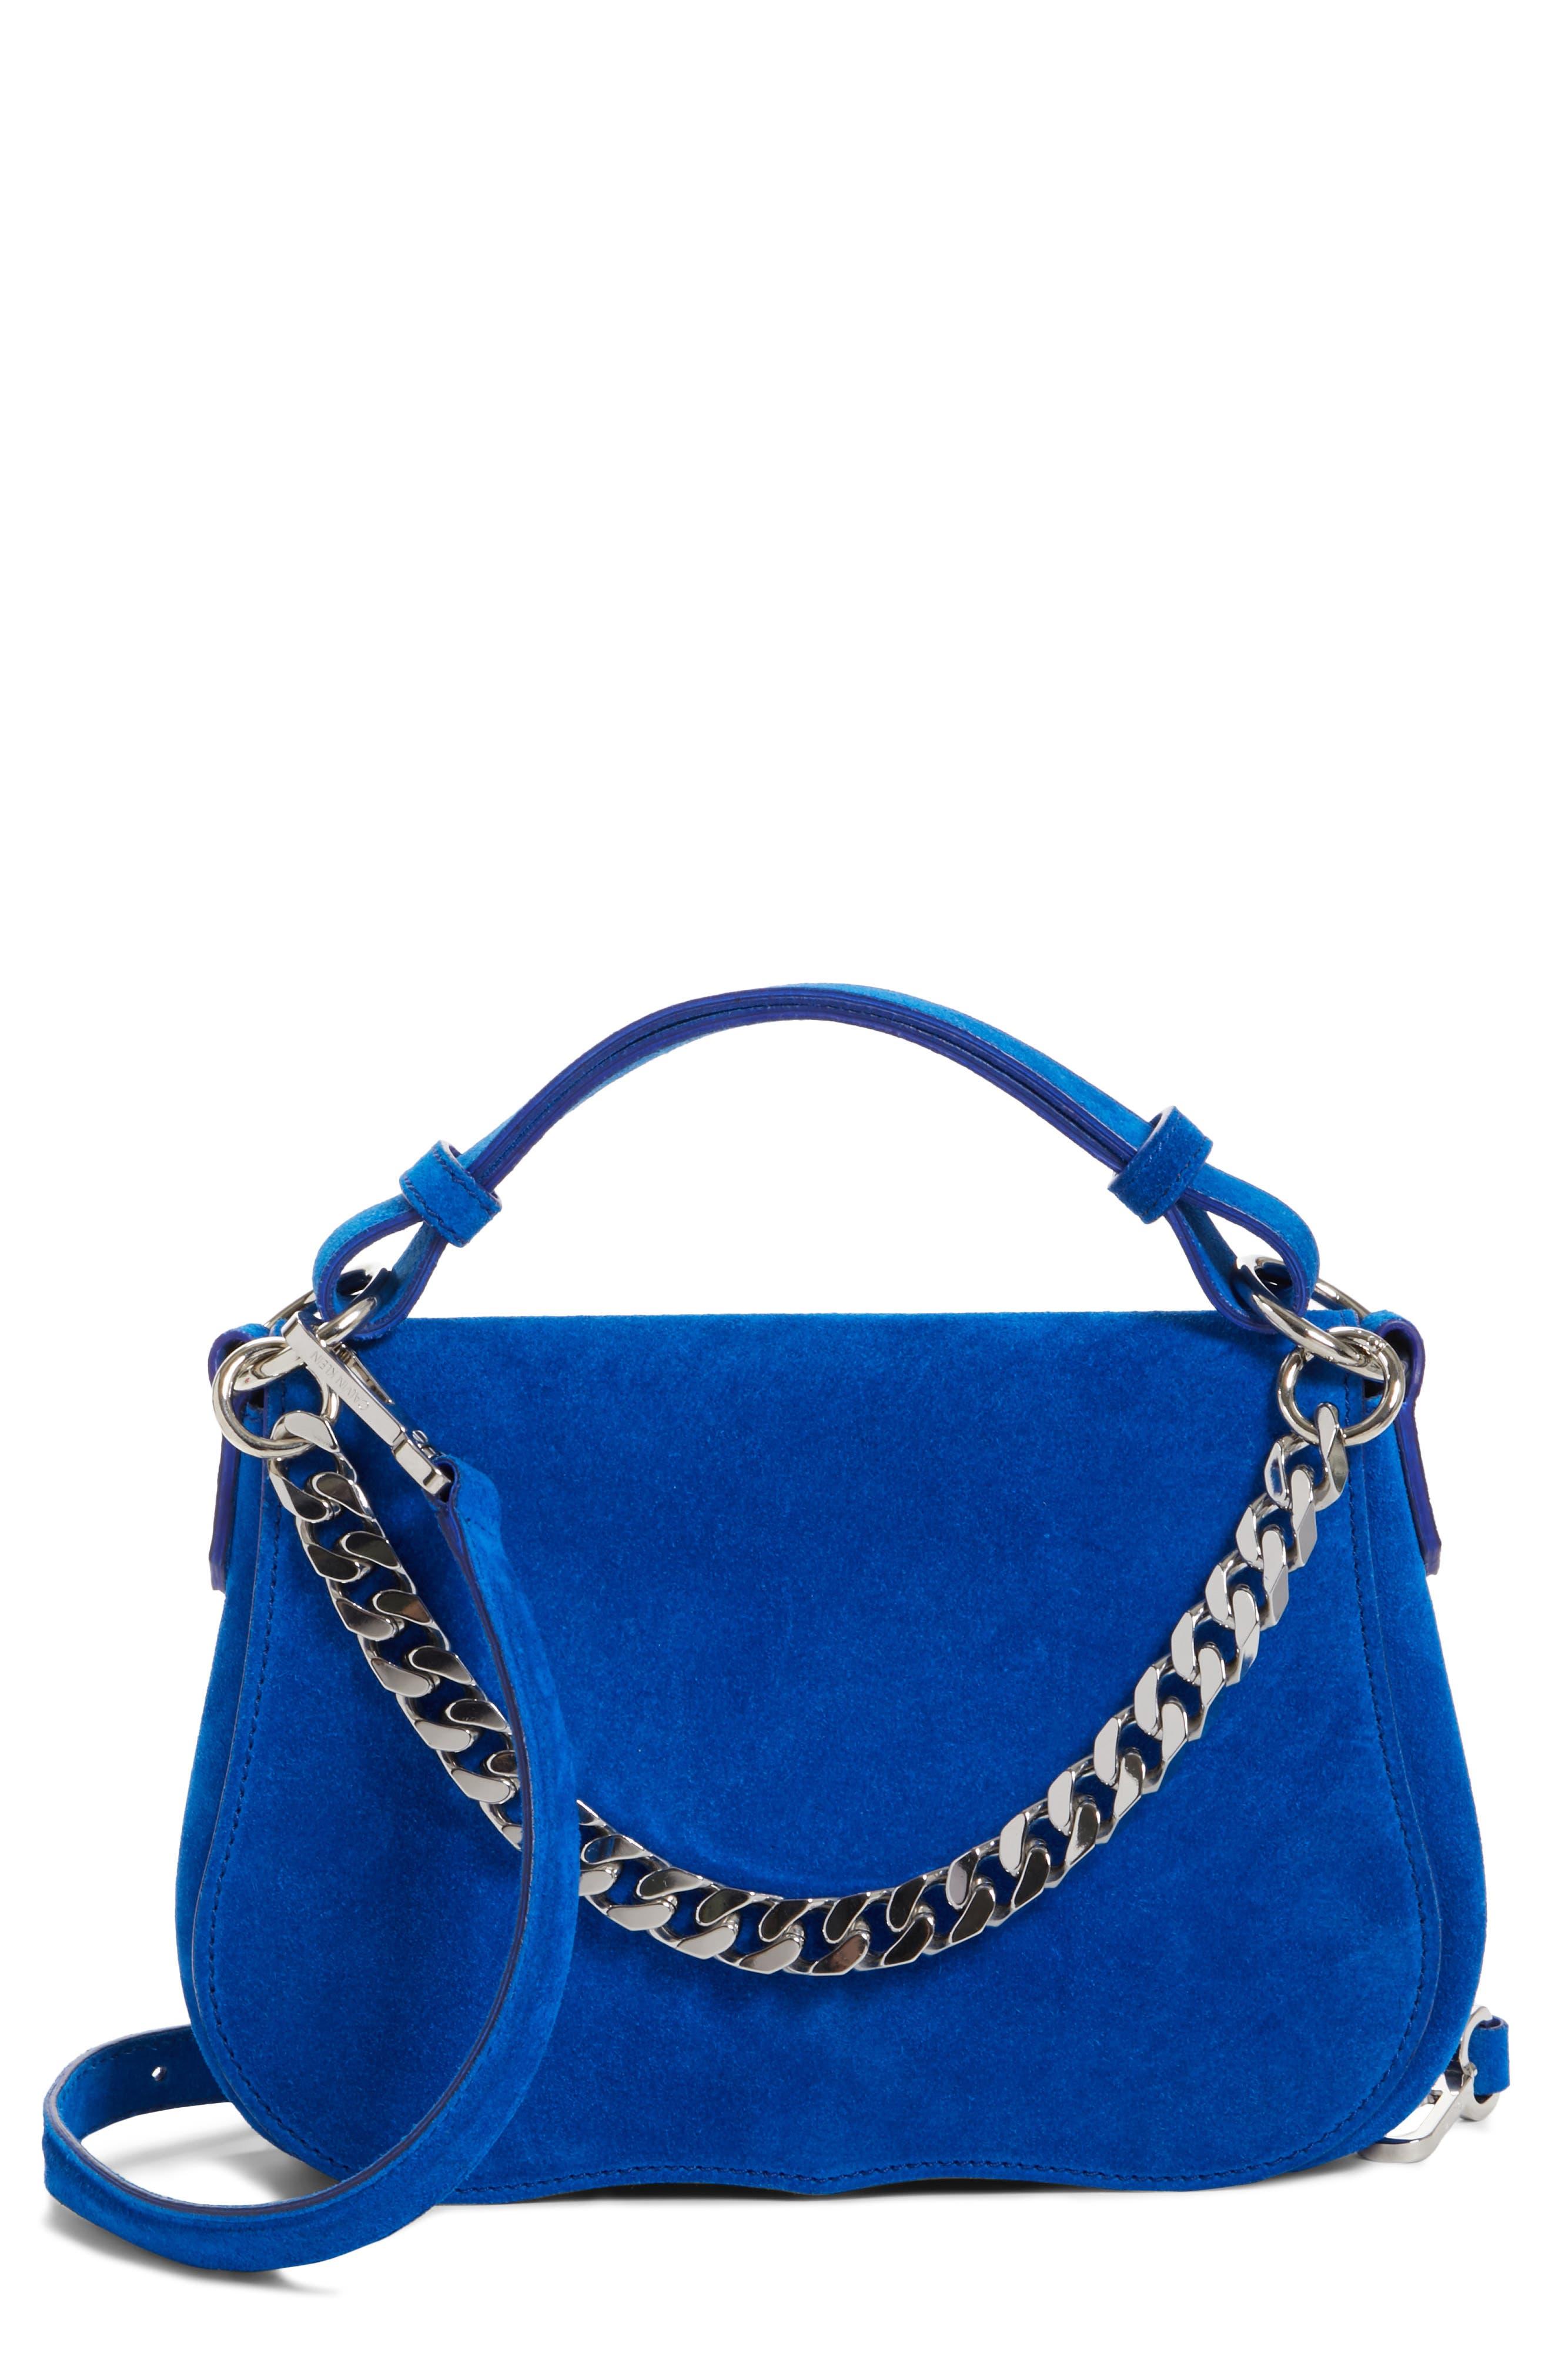 Main Image - CALVIN KLEIN 205W39NYC Small Suede Shoulder Bag